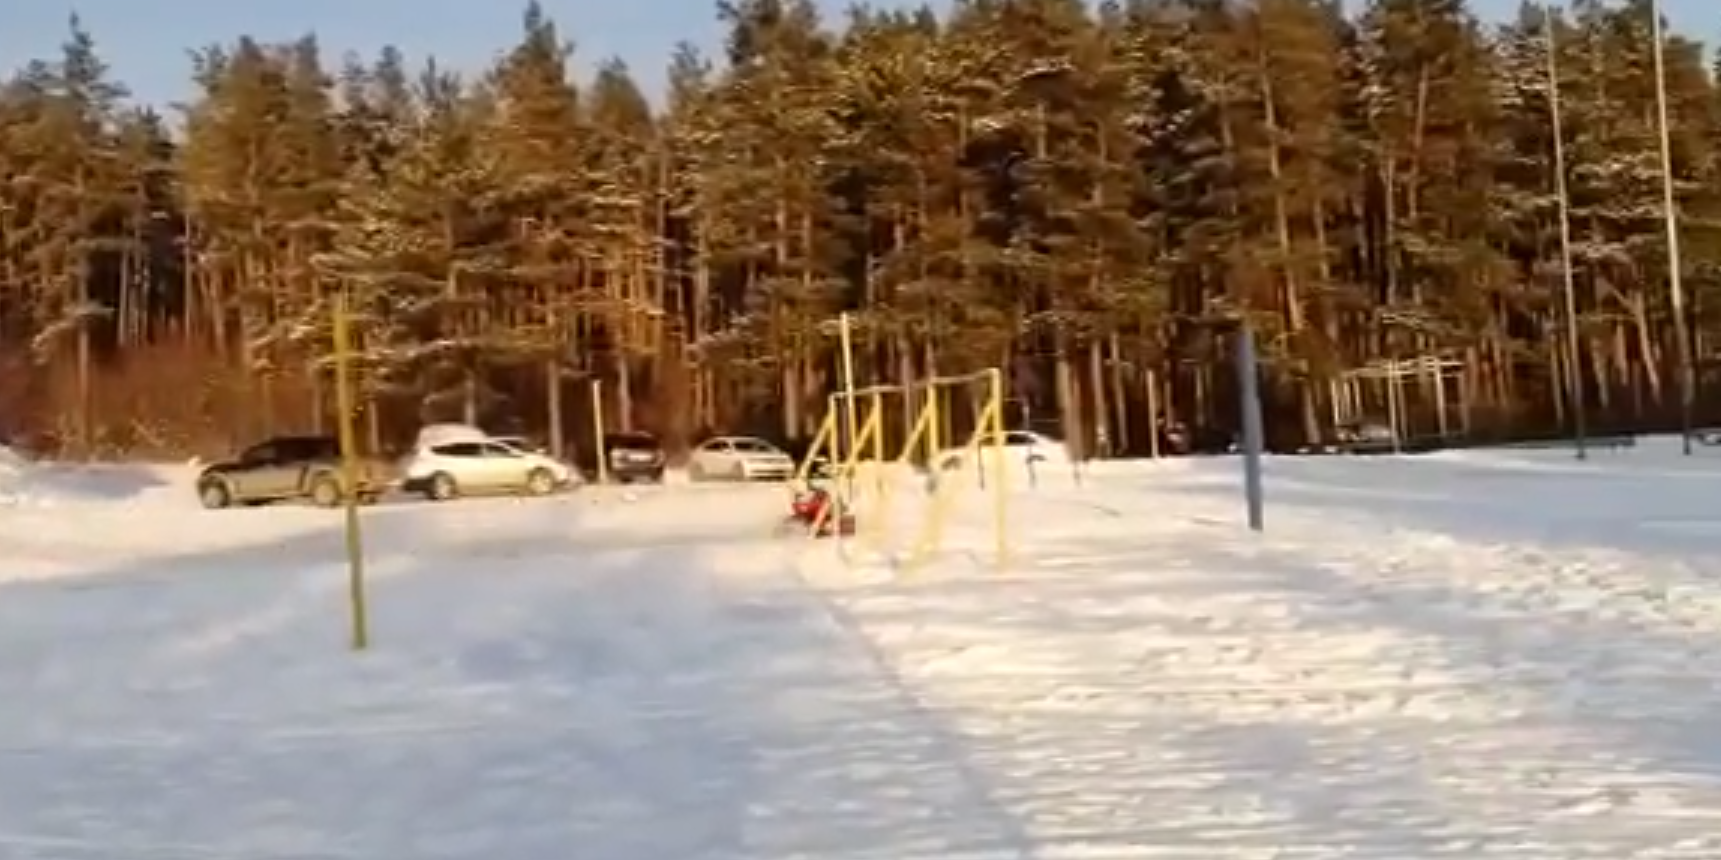 В Татарстане девушка разбилась о столб во время катания на тюбинге